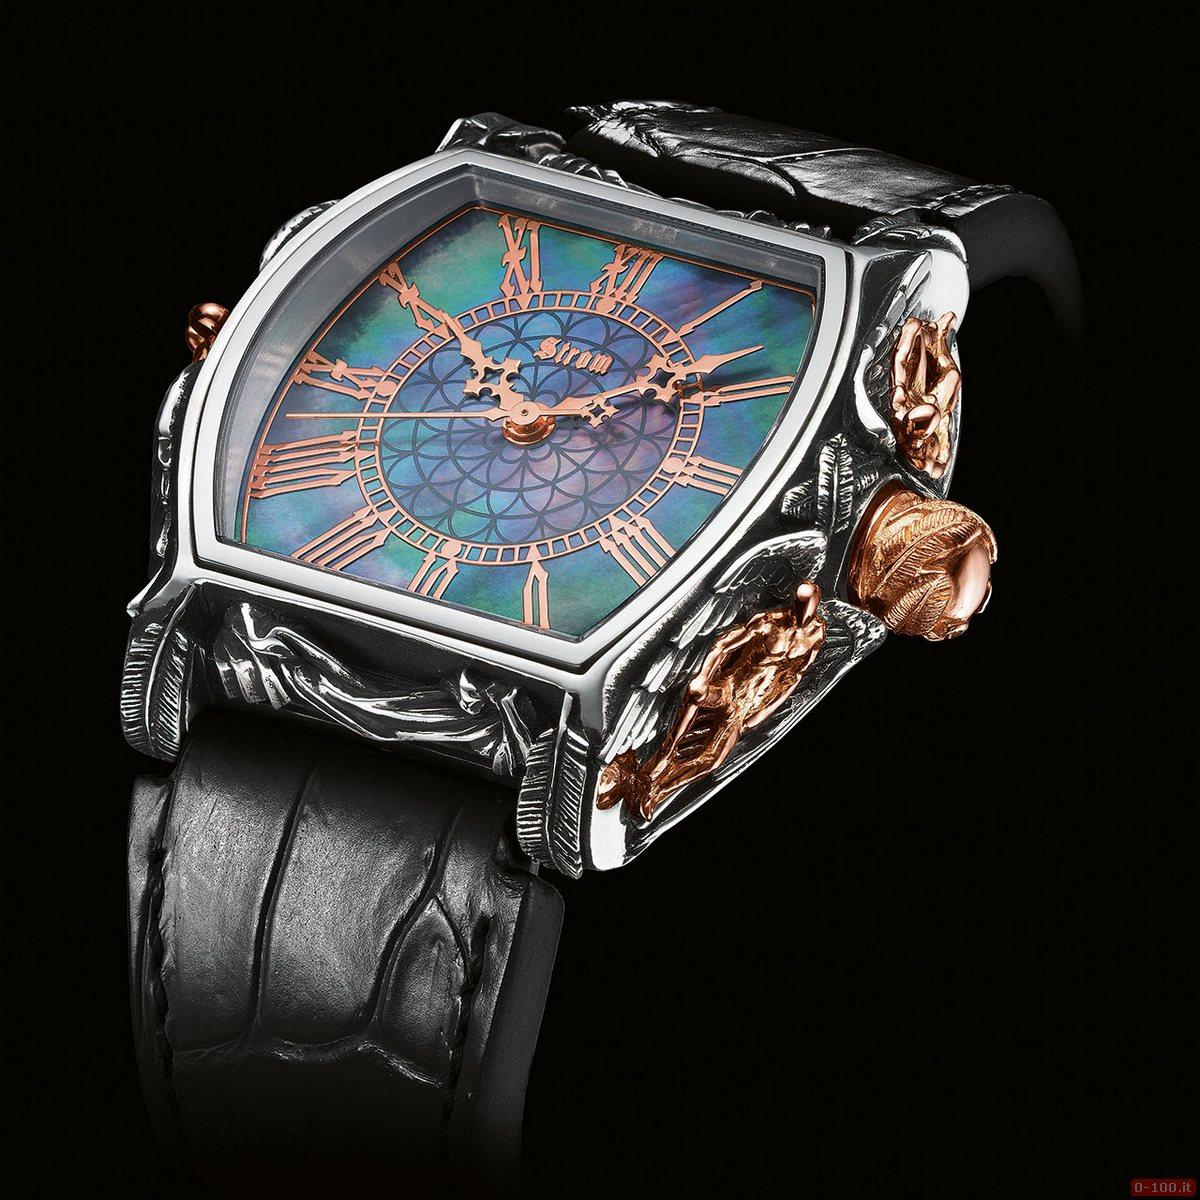 Daniel Strom Angelus Watch-0-1001